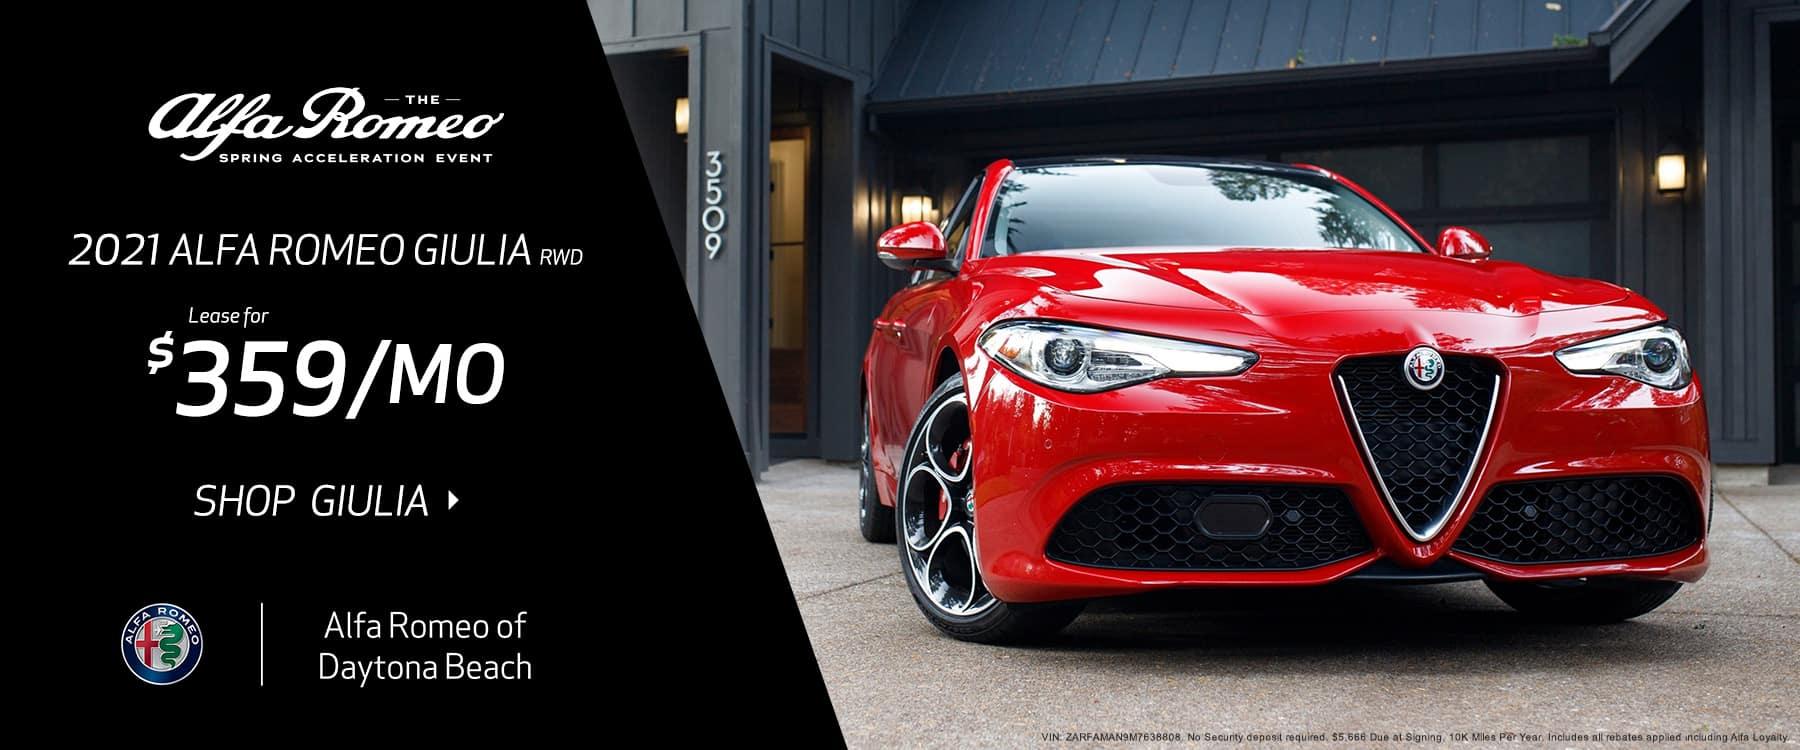 DMAR-2104-Alfa-Romeo-1800×750-01